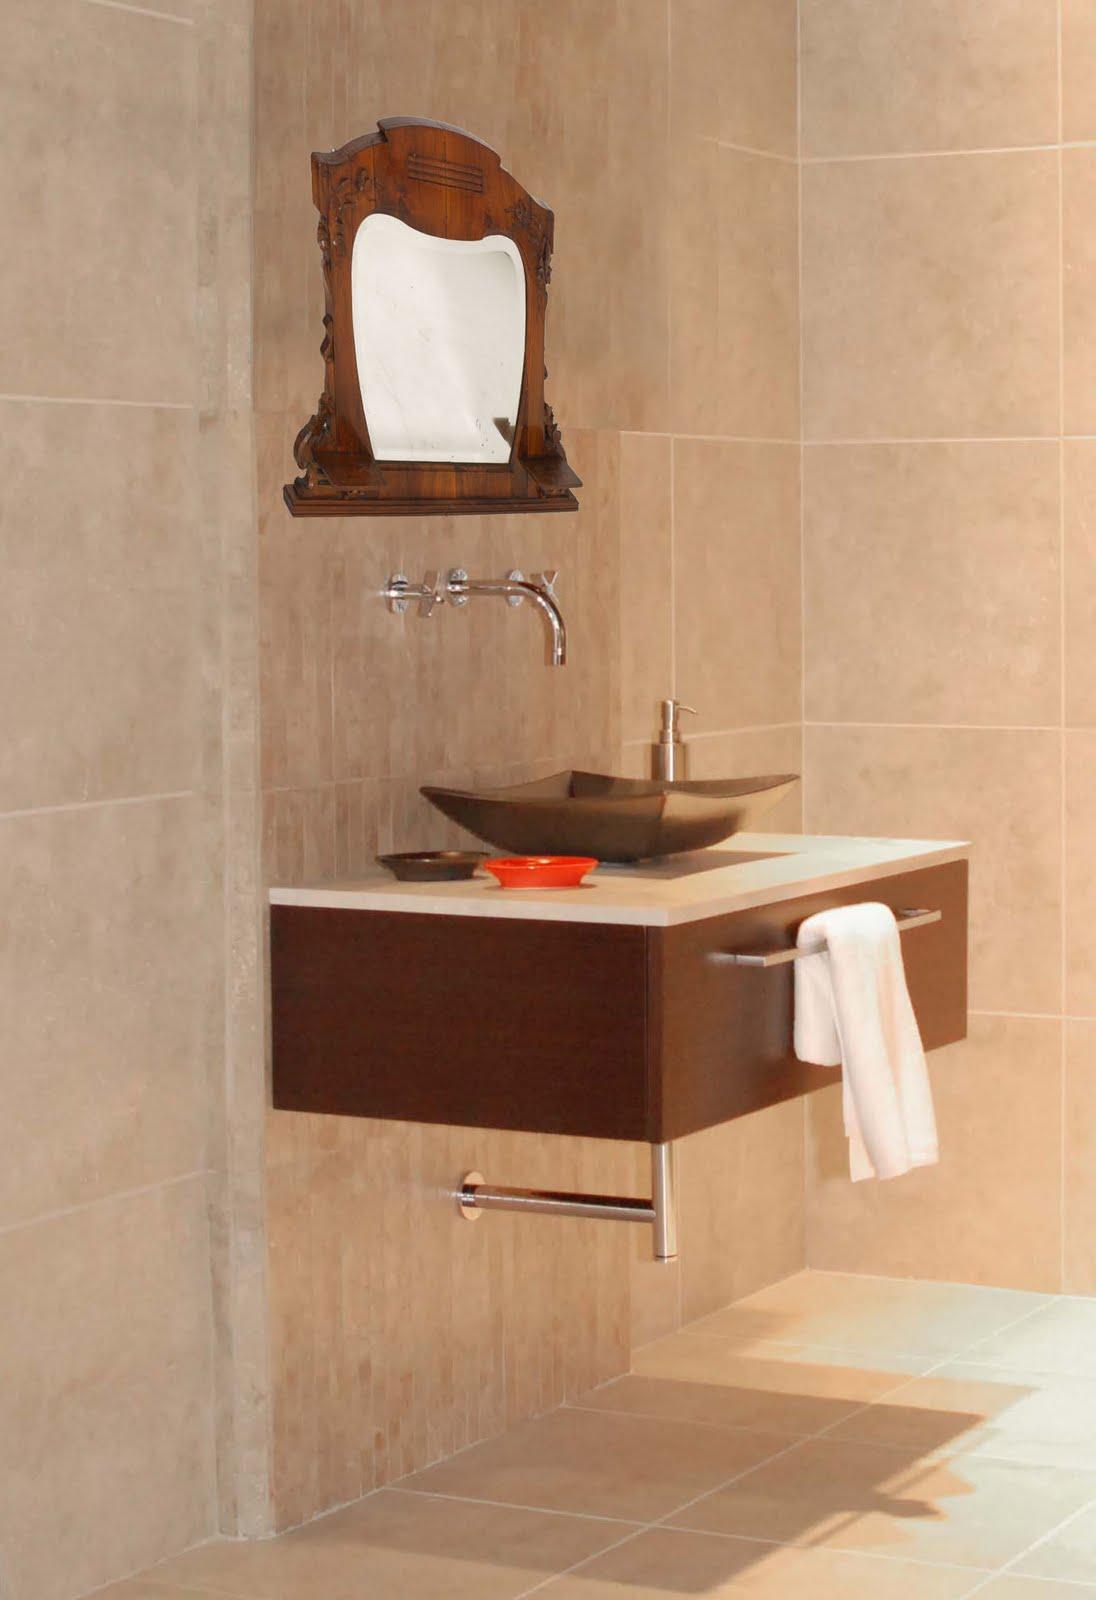 specchiera bagno specchio art nouveau